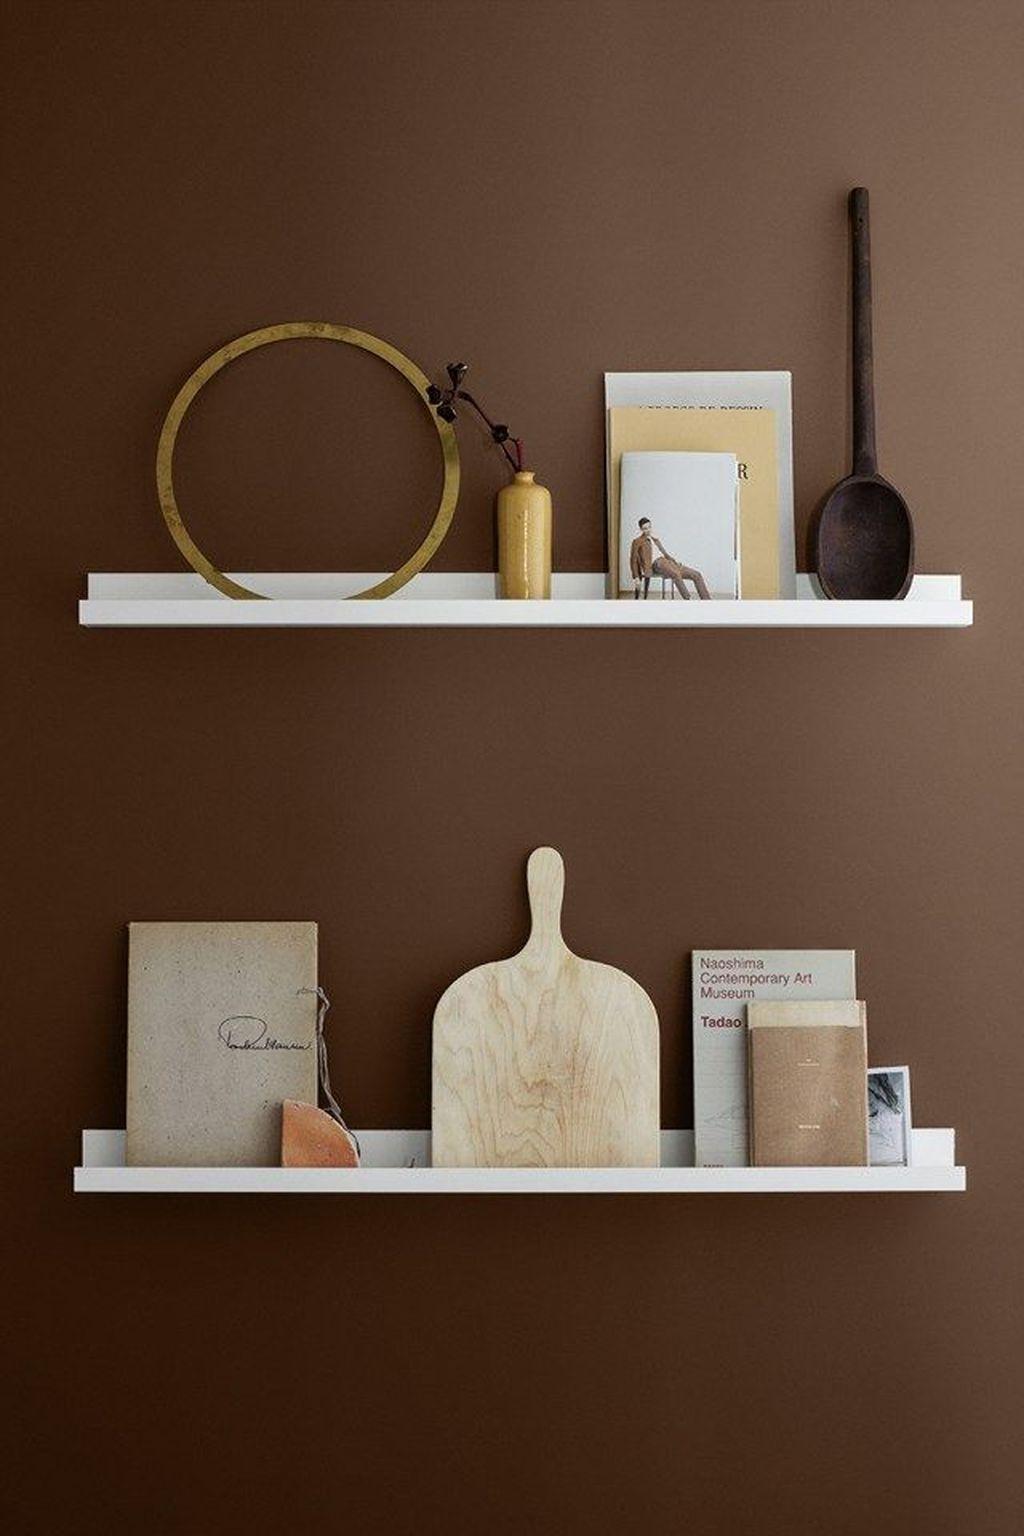 Splendid Deer Shelf Design Ideas With Minimalist Scandinavian Style To Try 09